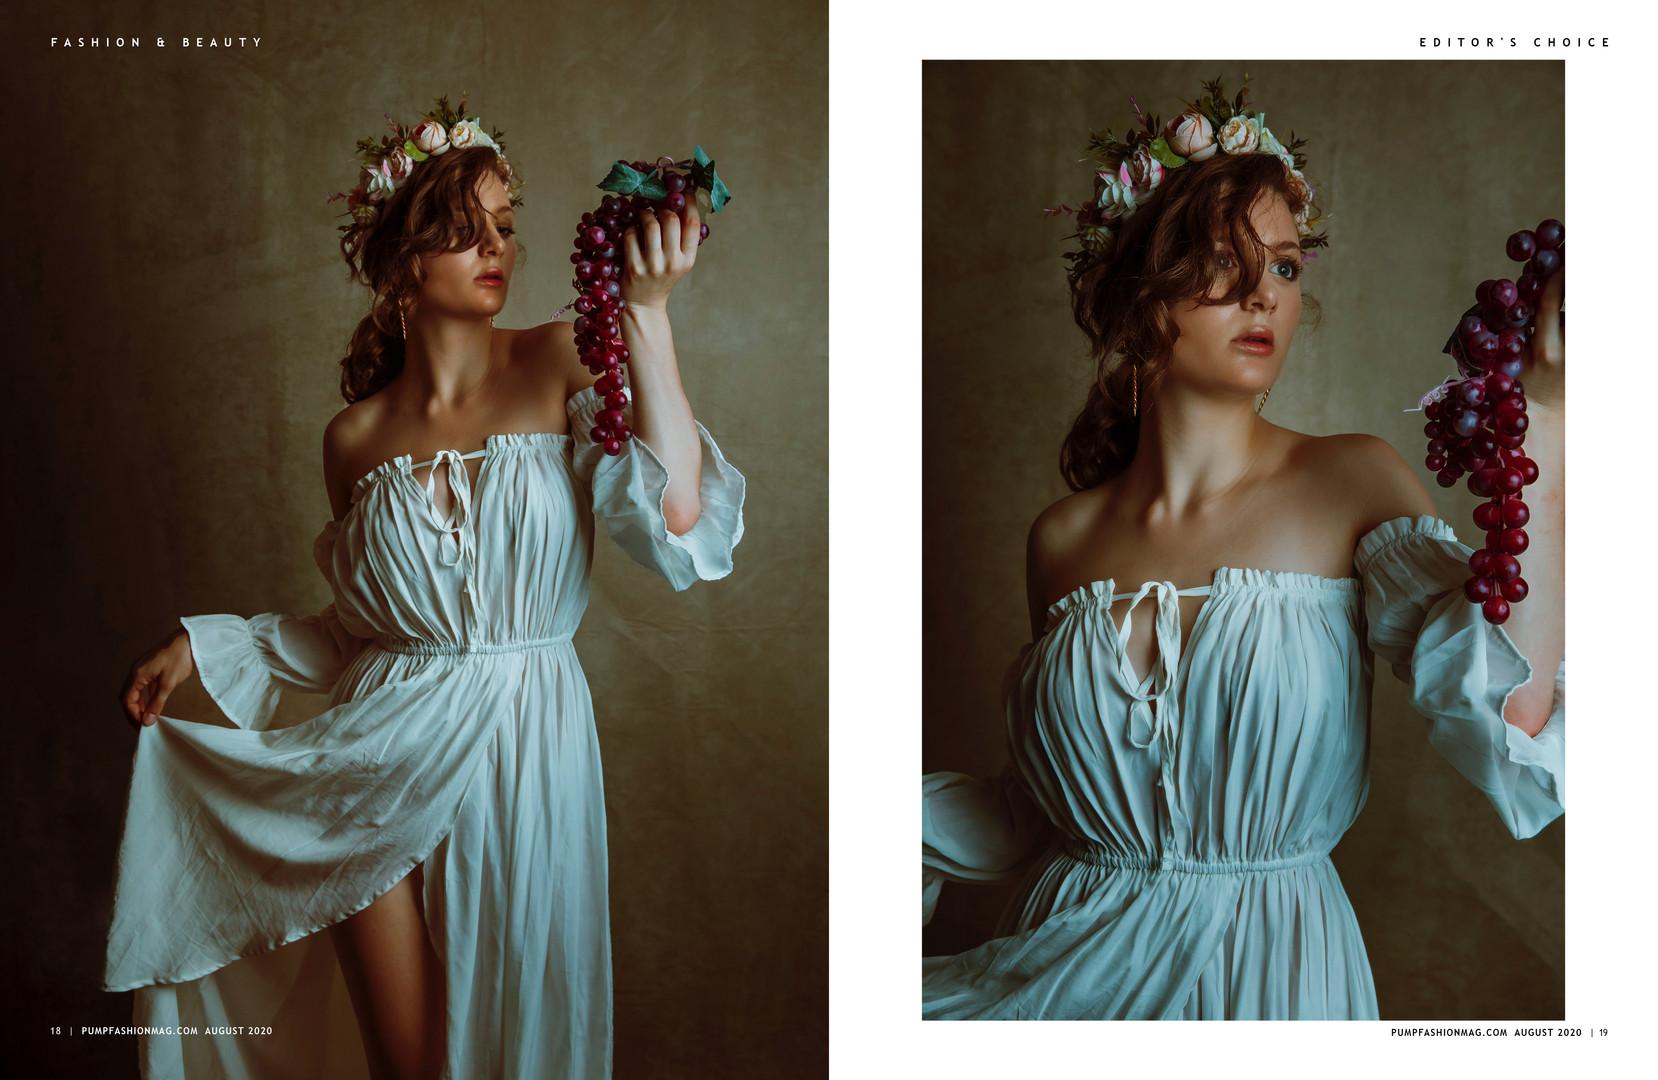 PUMP Magazine  Summer 2020  The Floral Edition   Vol.2,pgs. 16-23  Modern Renaissance by Neisha T. Ford